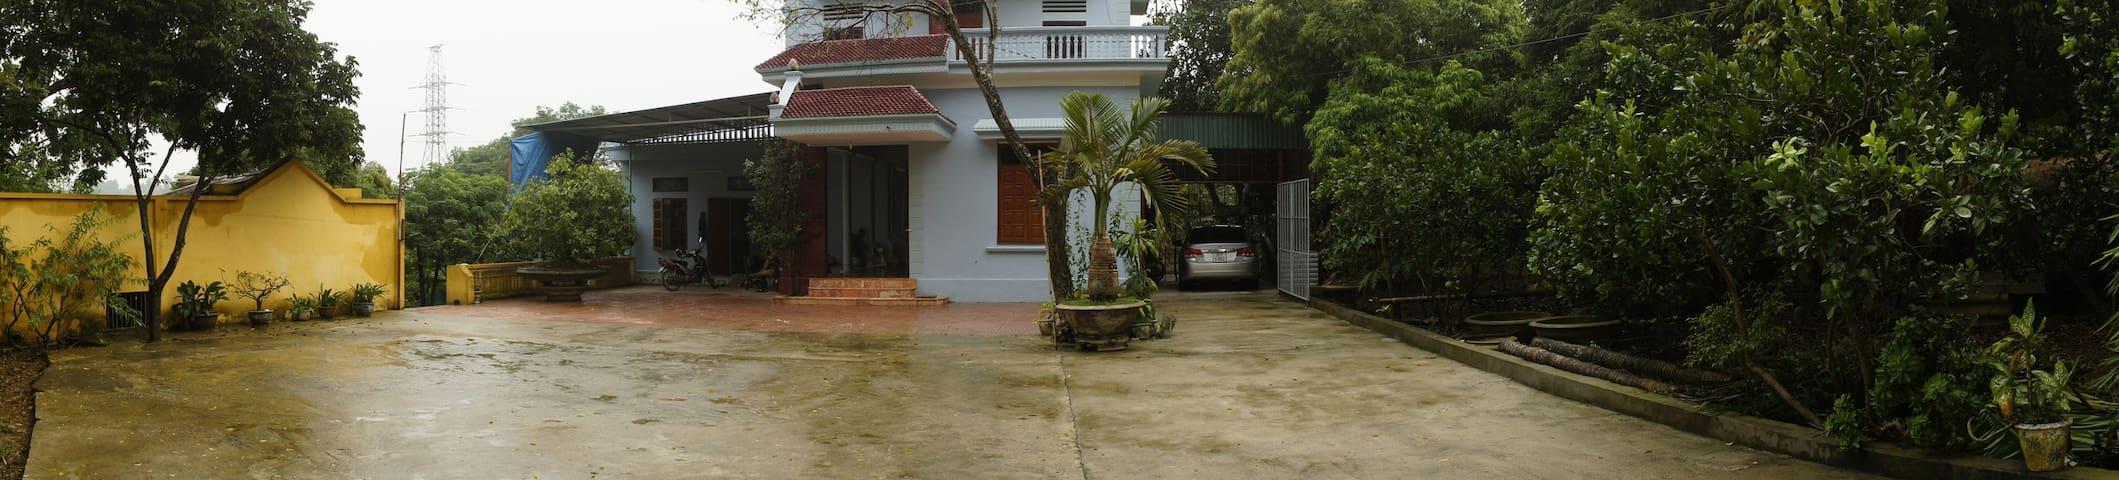 House in Countryside - Xuân Mai